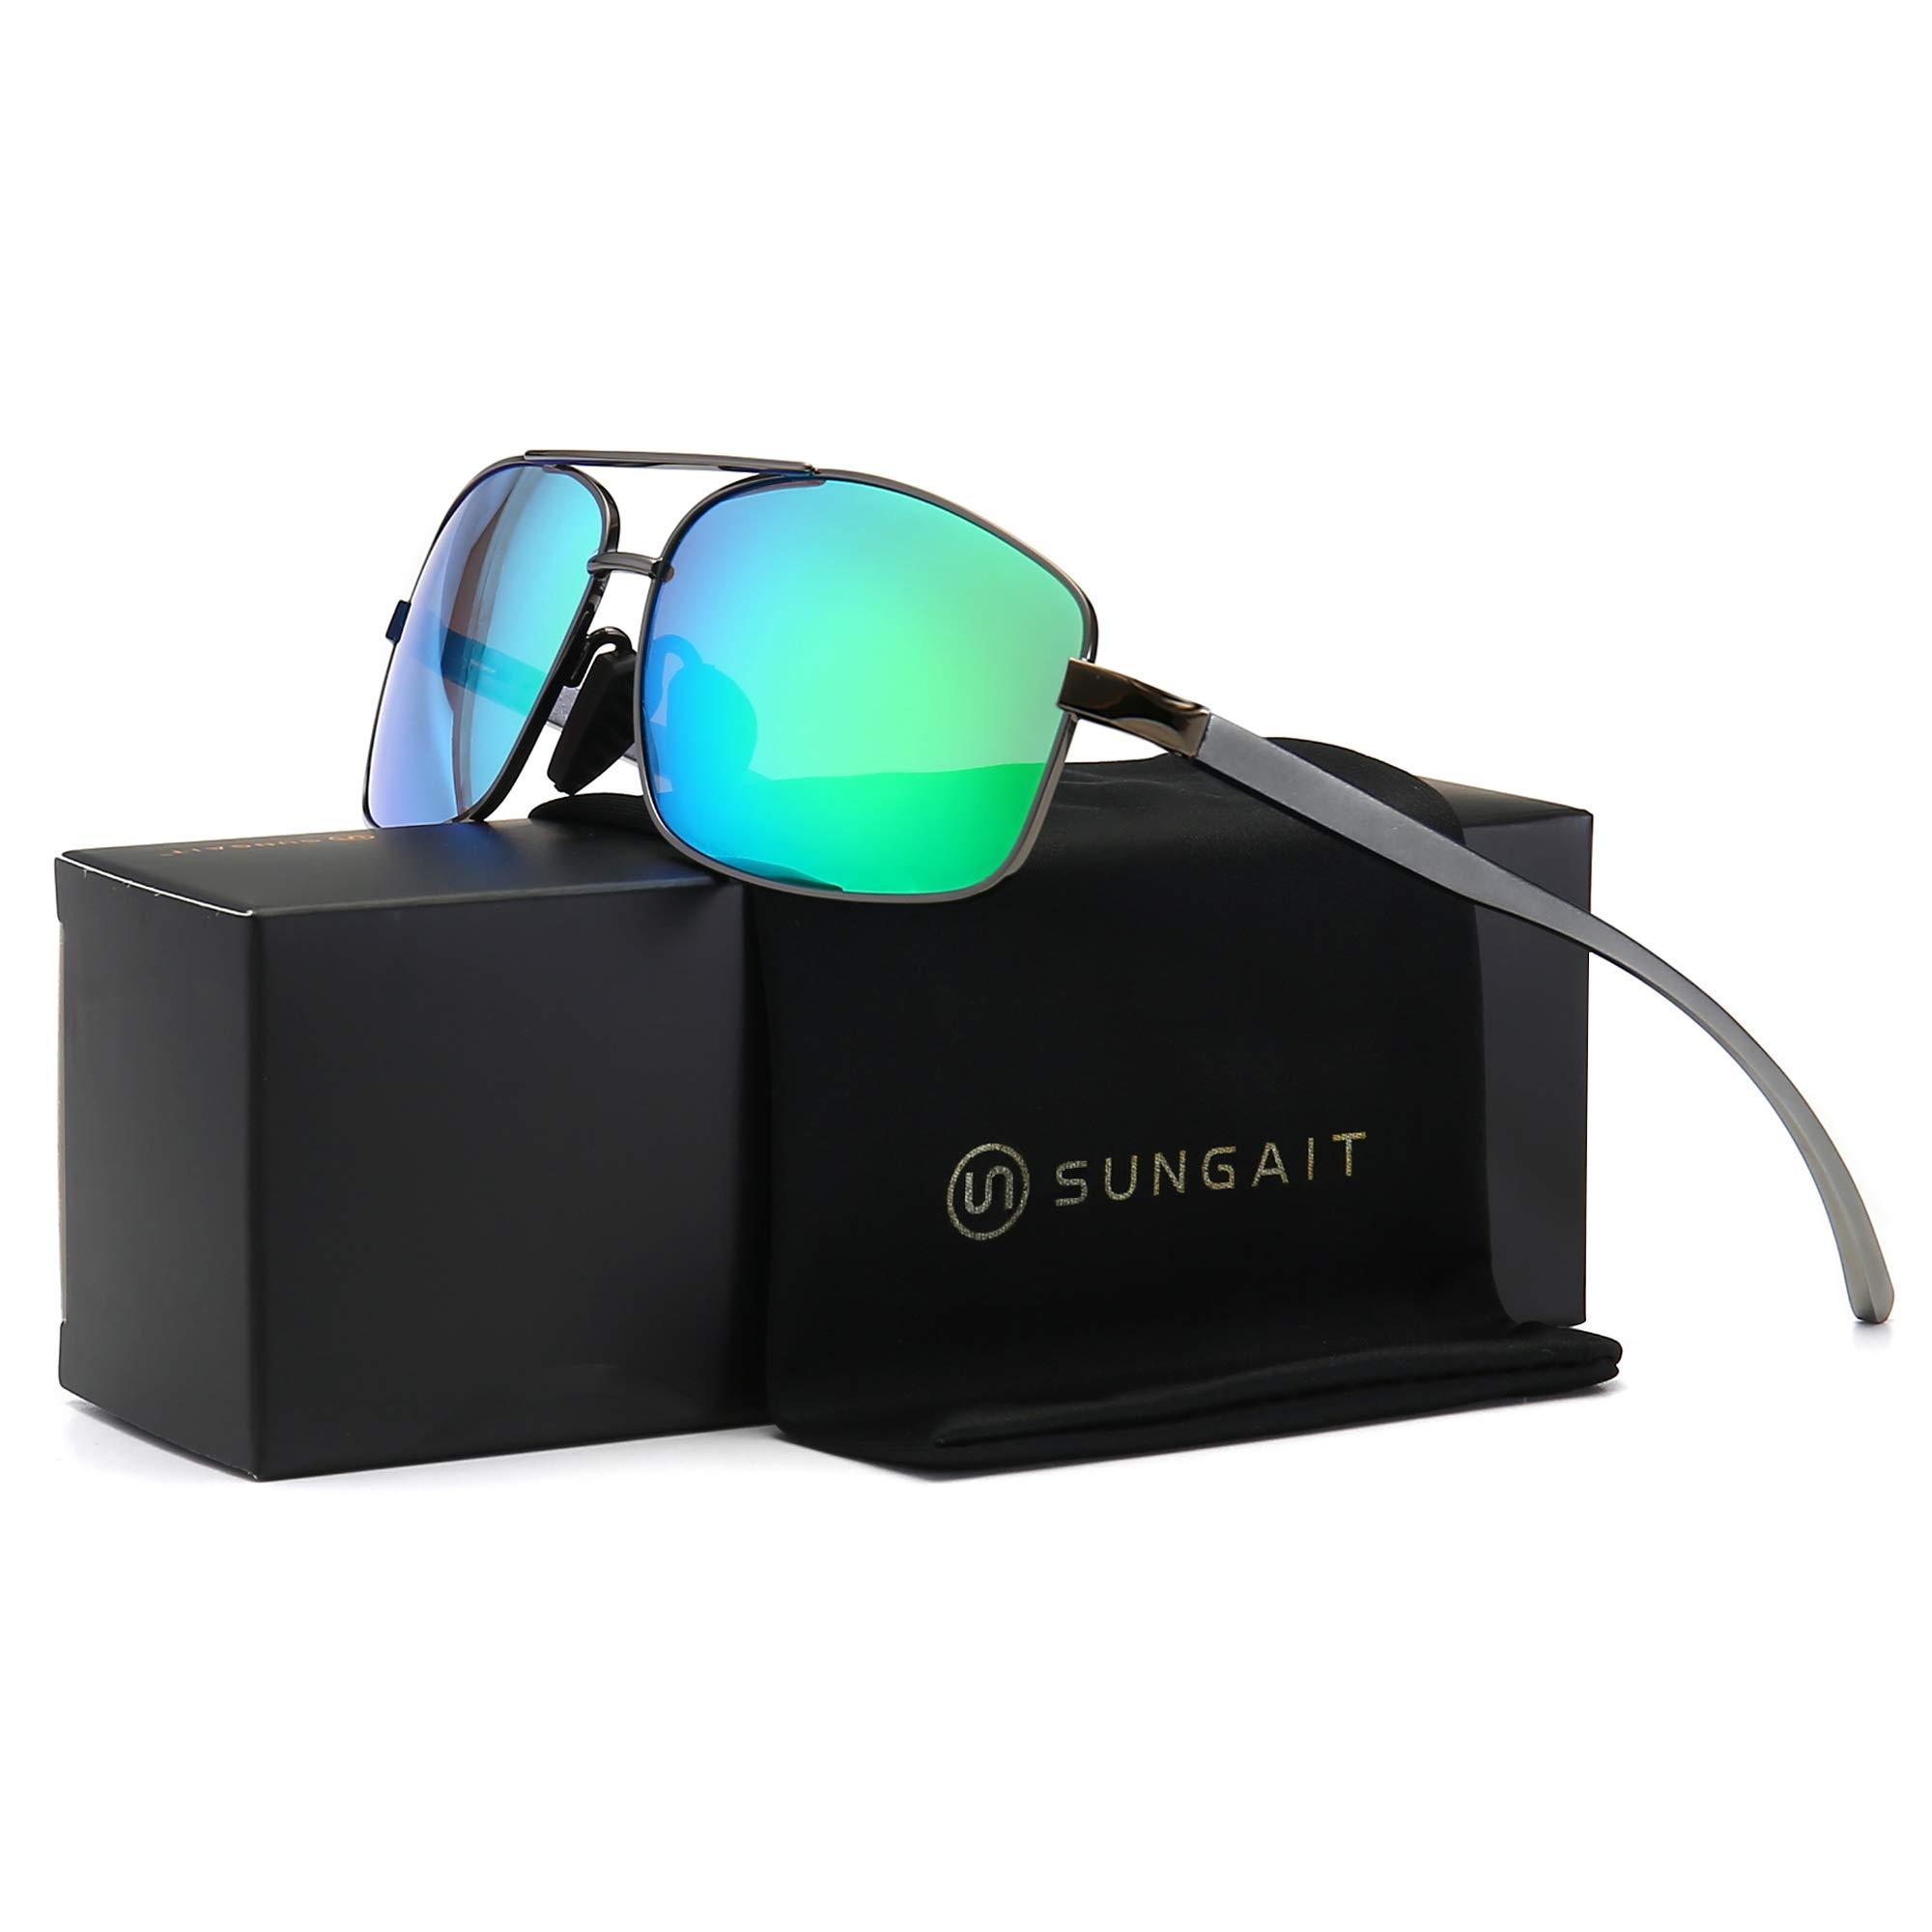 SUNGAIT Ultra Lightweight Rectangular Polarized Sunglasses UV400 Protection (Gunmetal Frame Green Mirror Lens, 62) Metal Frame 2458 QKLV by SUNGAIT